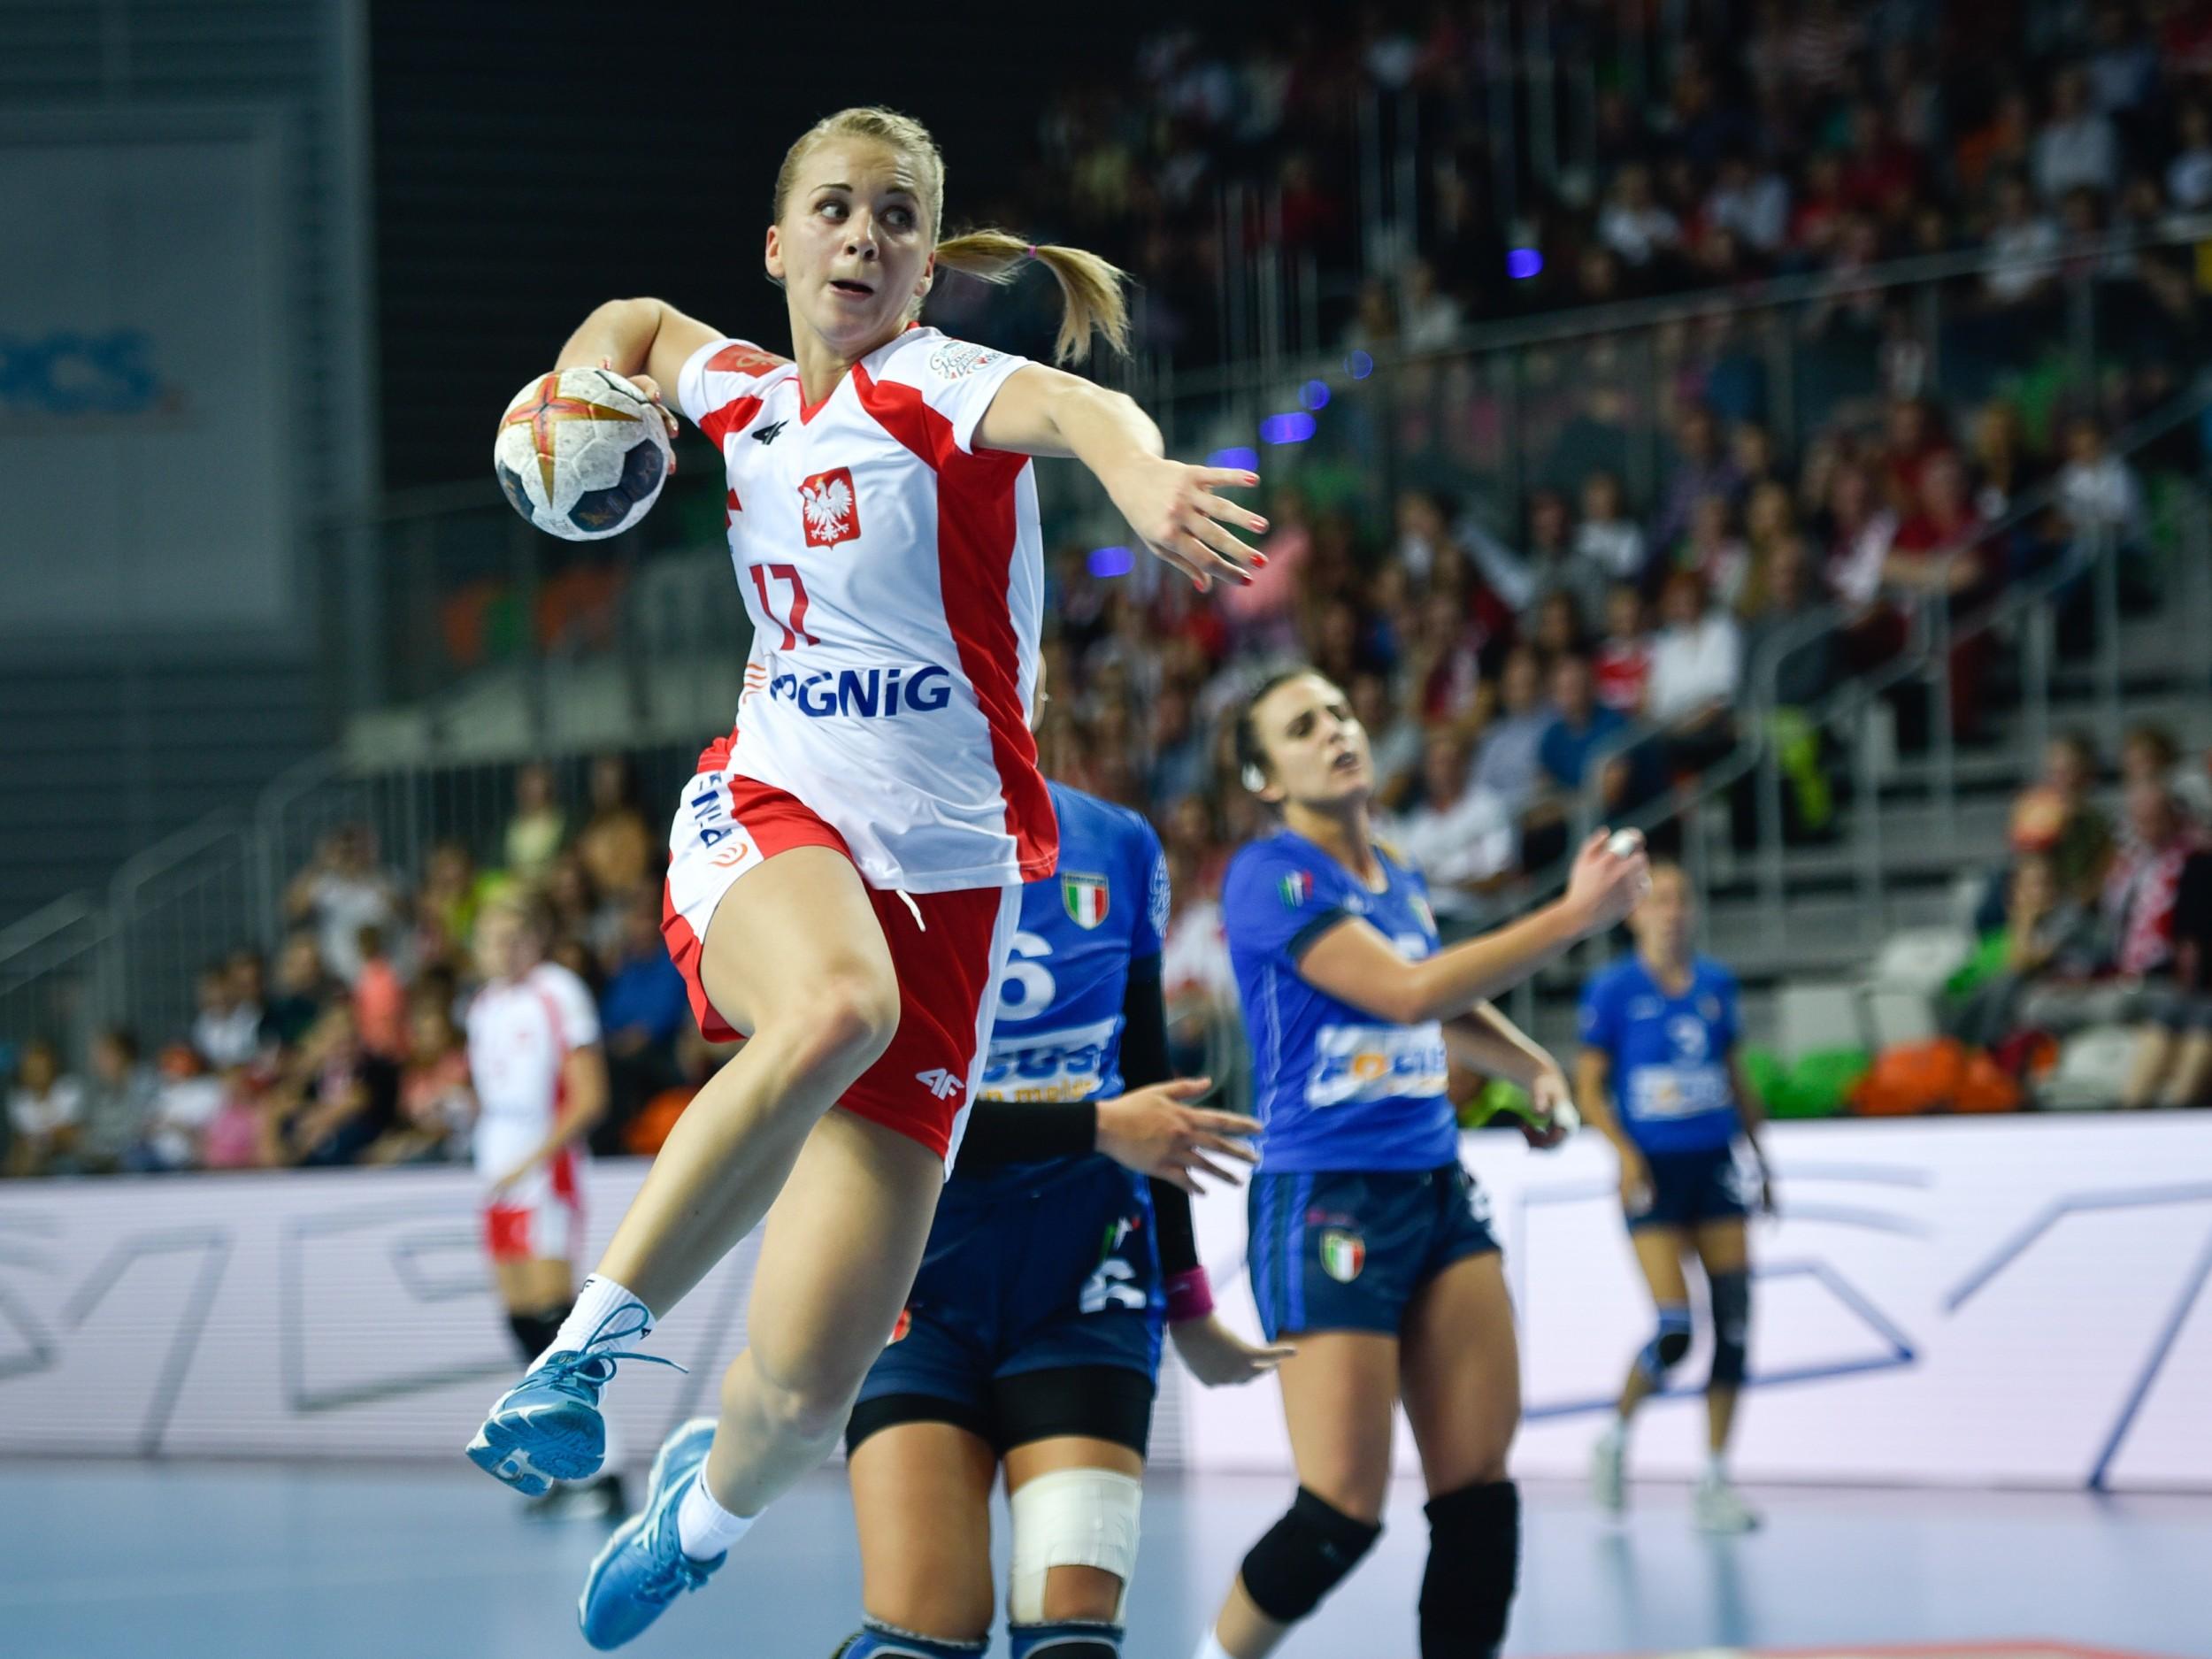 Esporte  Handebol. Foto  Dziurek   Shutterstock.com 1c3d3bc34f4fd